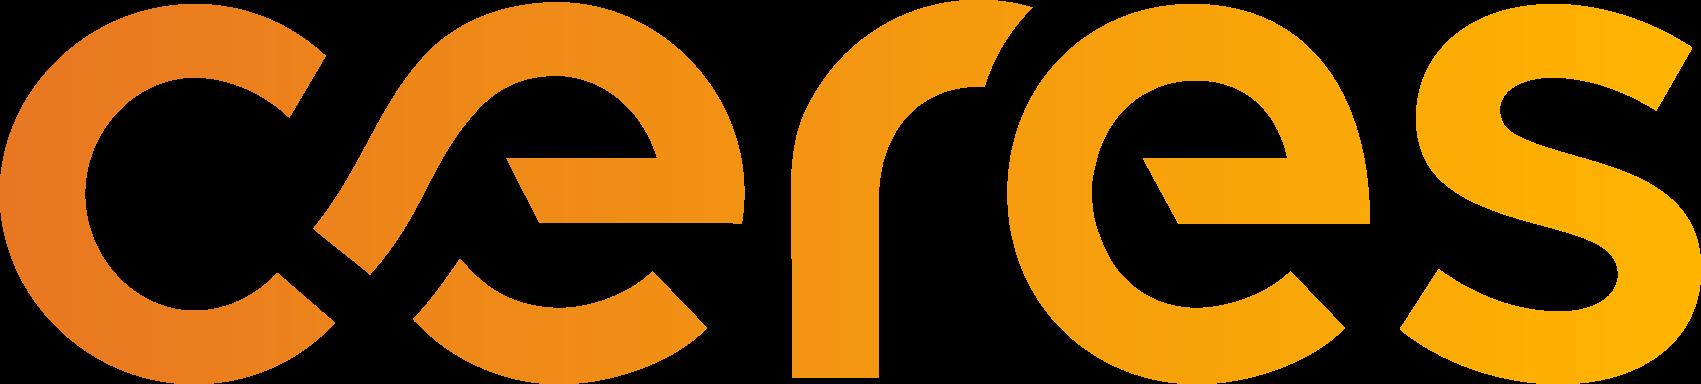 CERES POWER HOLDINGS PLC Logo